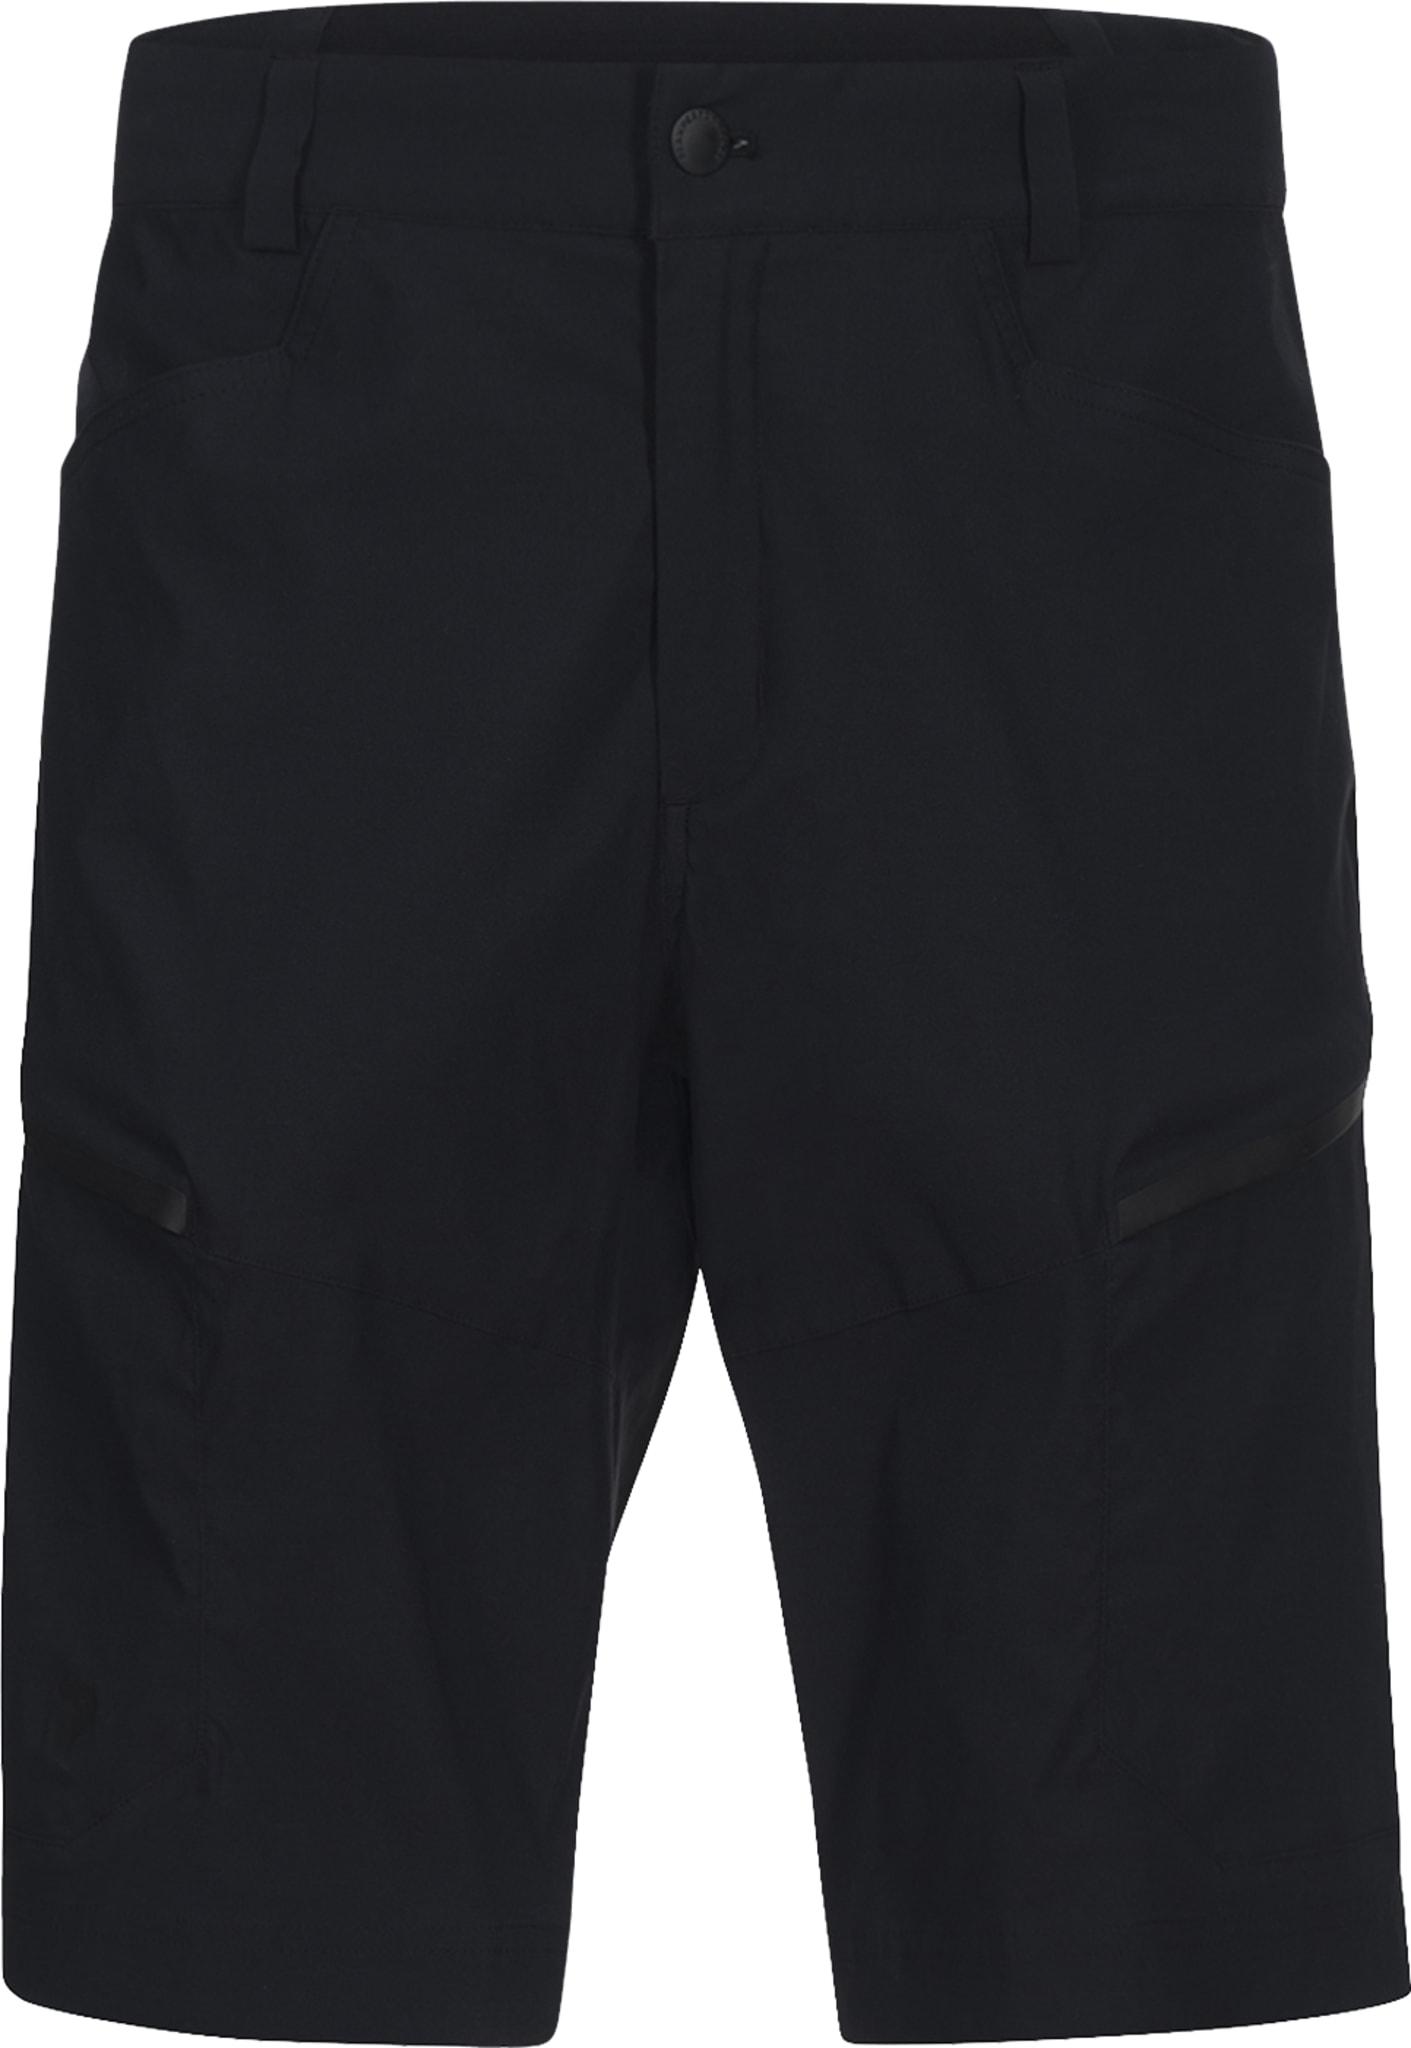 c86cd2d5 Iconic Cargo Shorts W